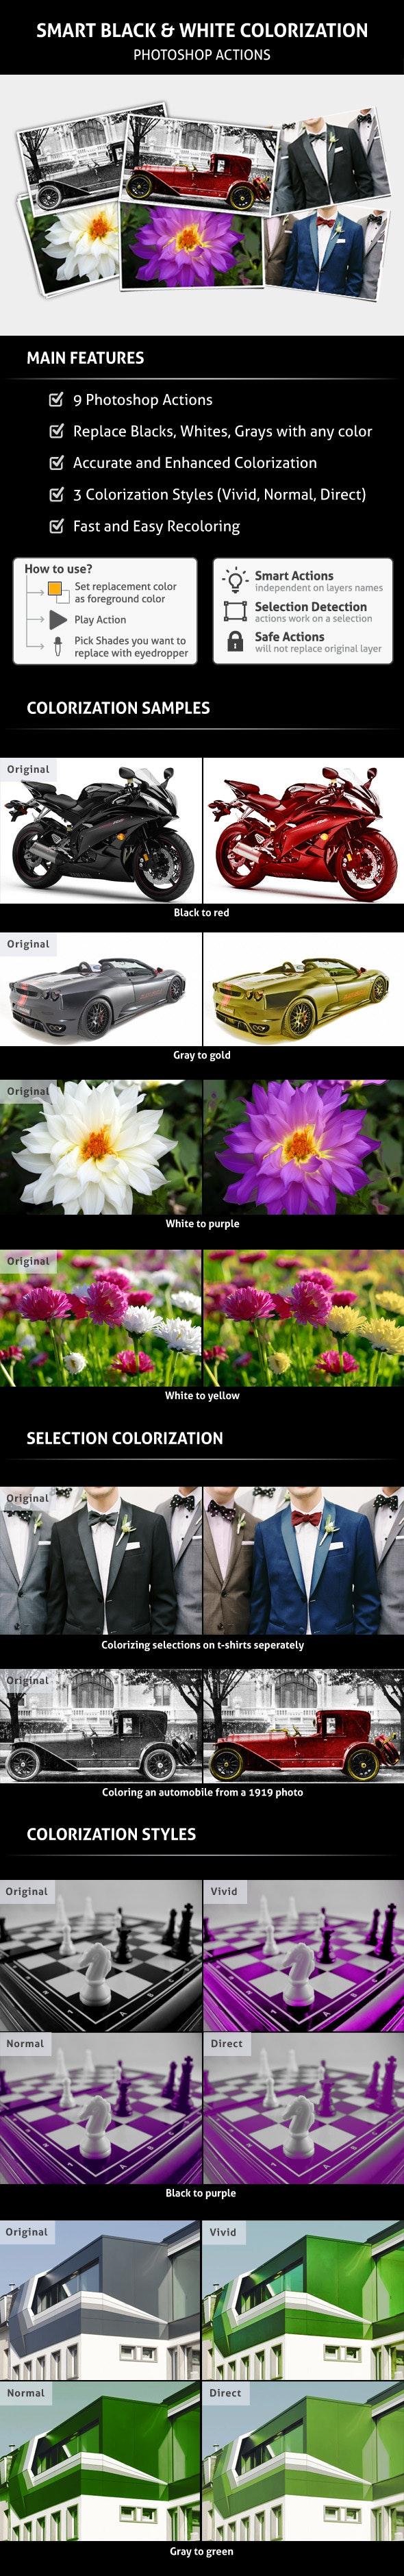 Smart Black & White Colorization - Utilities Actions